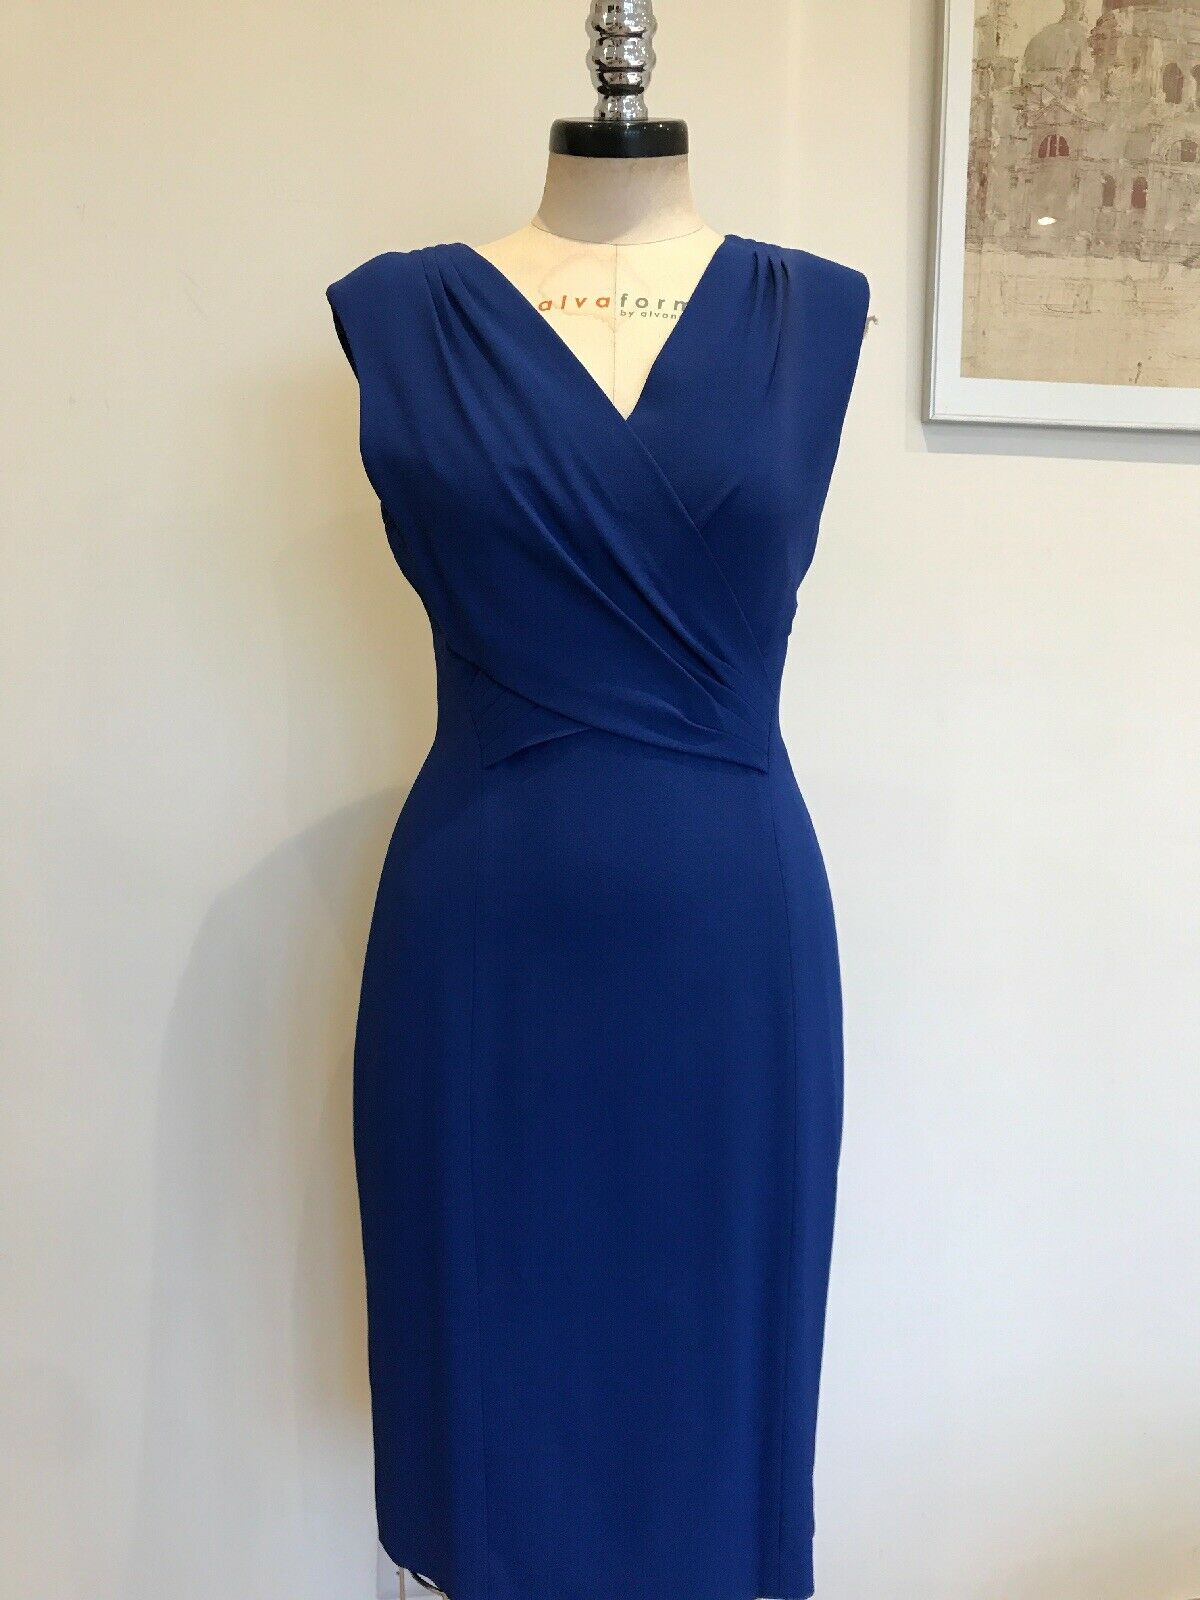 Ladies Top Designer LK Bennett bluee Dress size 12 Brand New With Tags